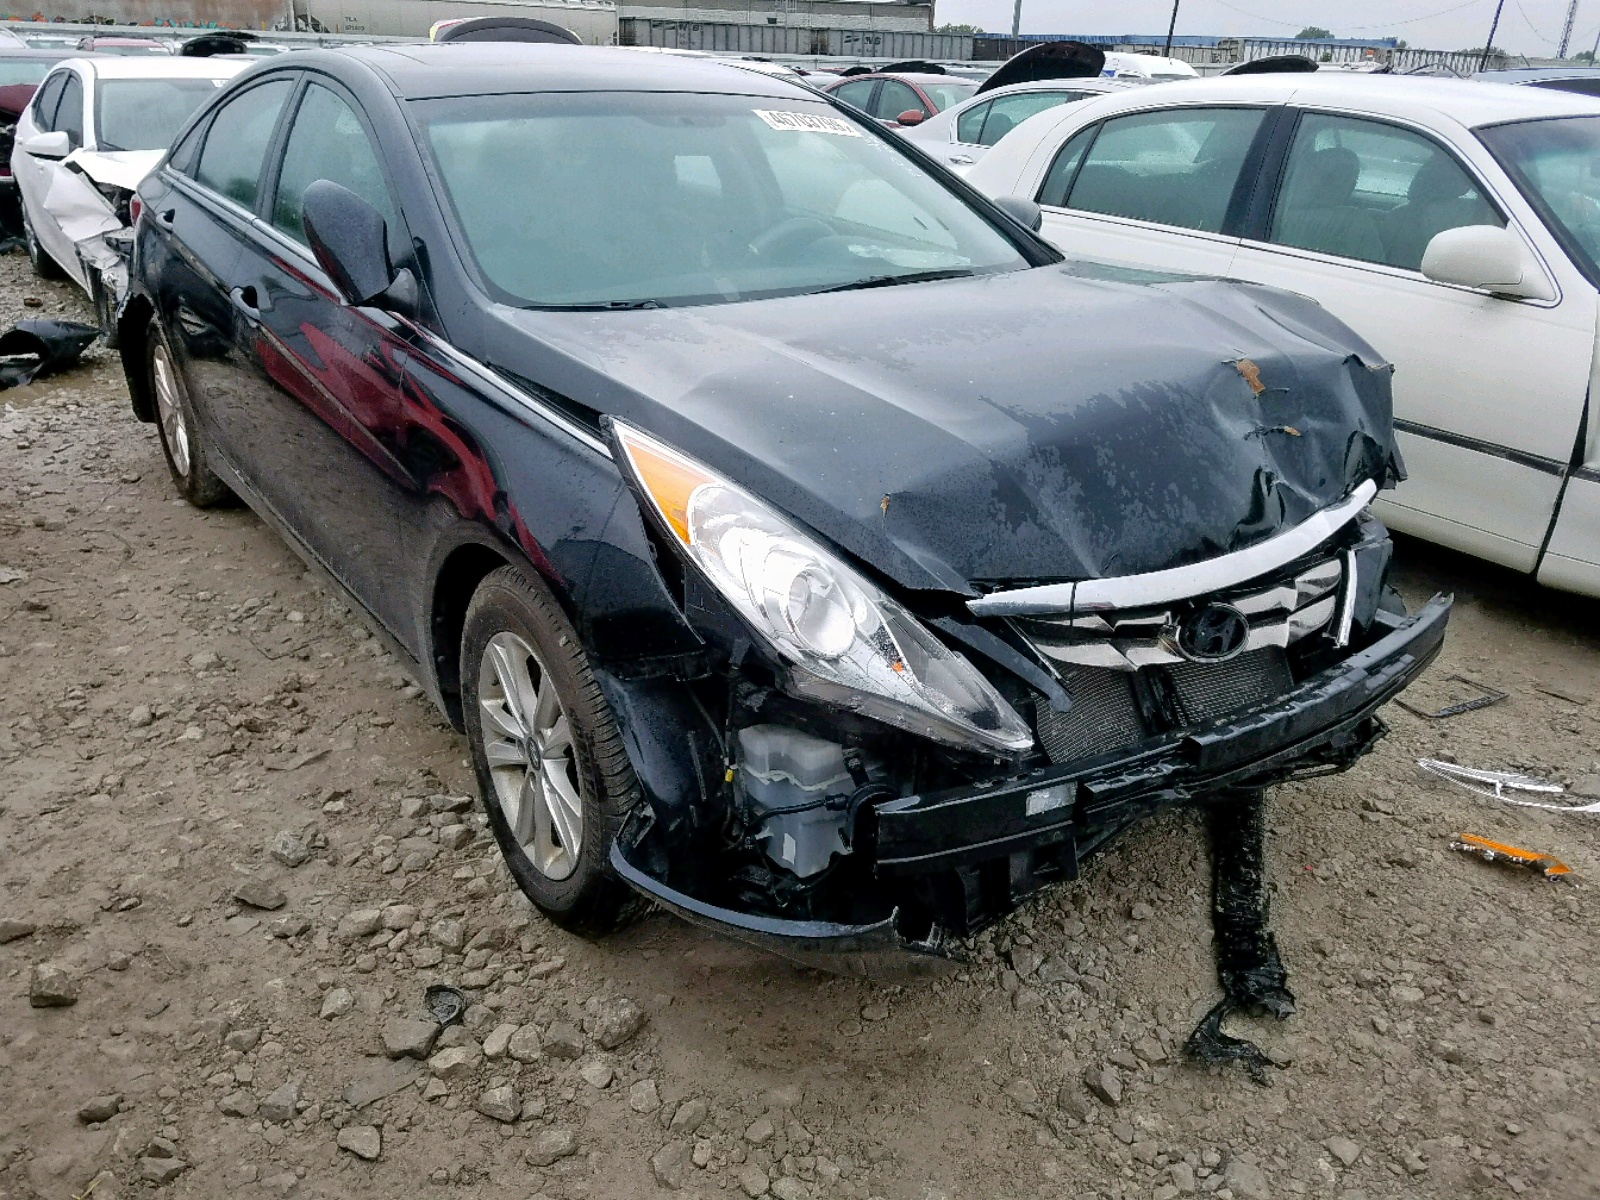 2013 Hyundai Sonata Gls 2.4L Left View